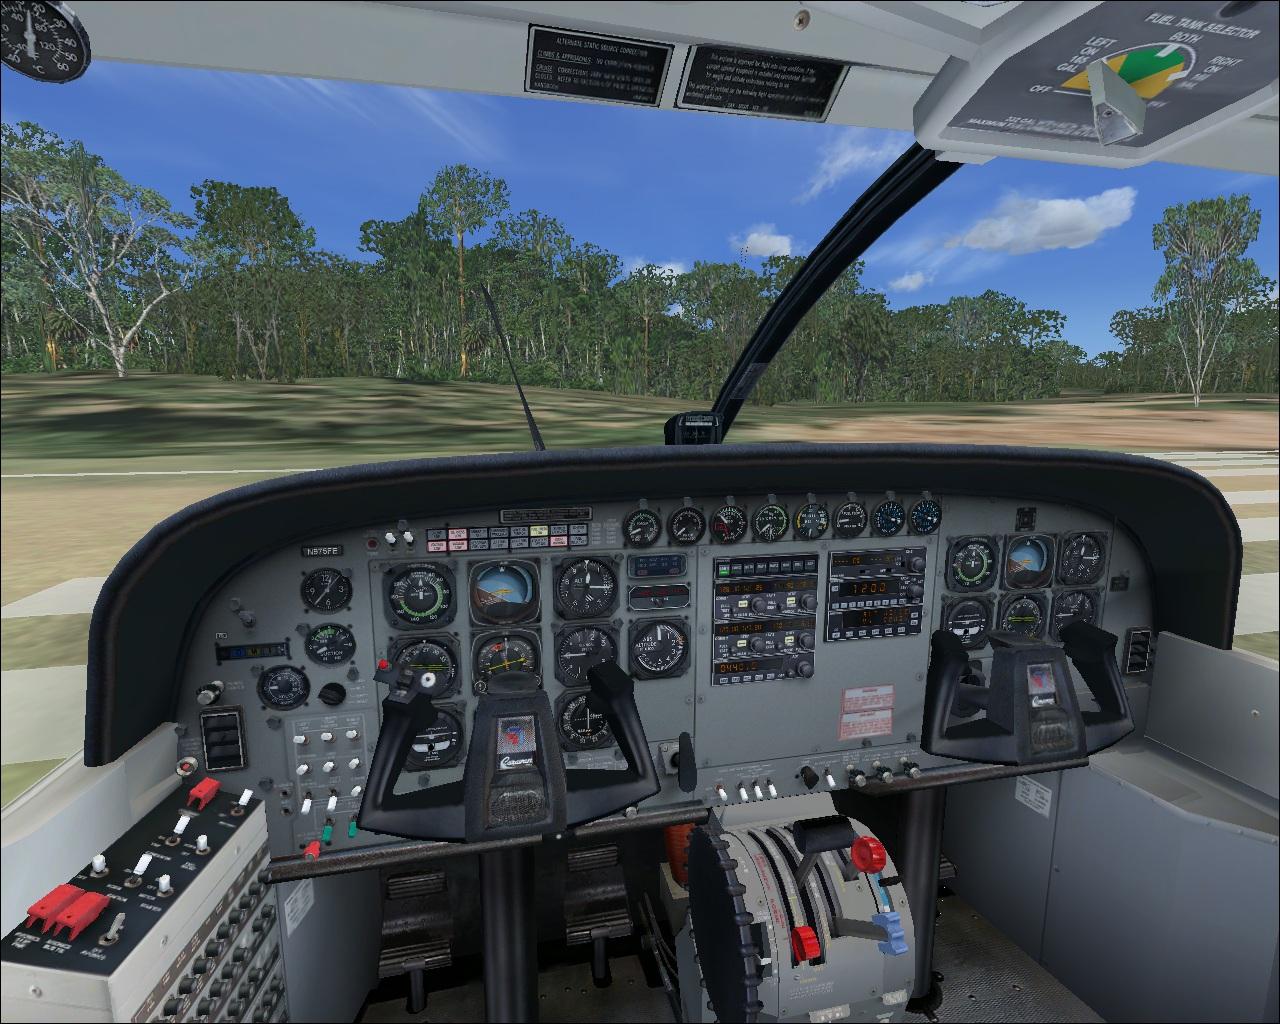 http://2.bp.blogspot.com/_phh8p32okQI/TEdOGmvmcWI/AAAAAAAAAMo/hX8W_IEvQQU/s1600/C208B-Cockpit-3D.jpg